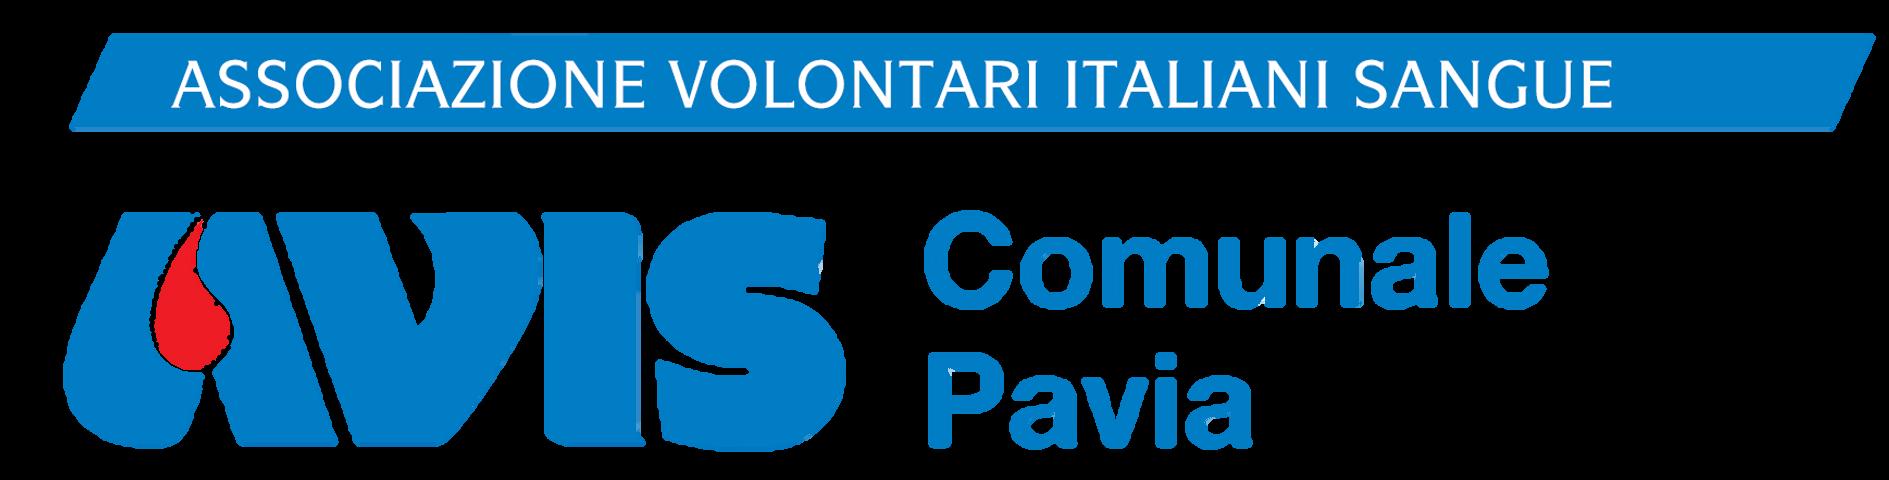 AVIS Pavia Logo